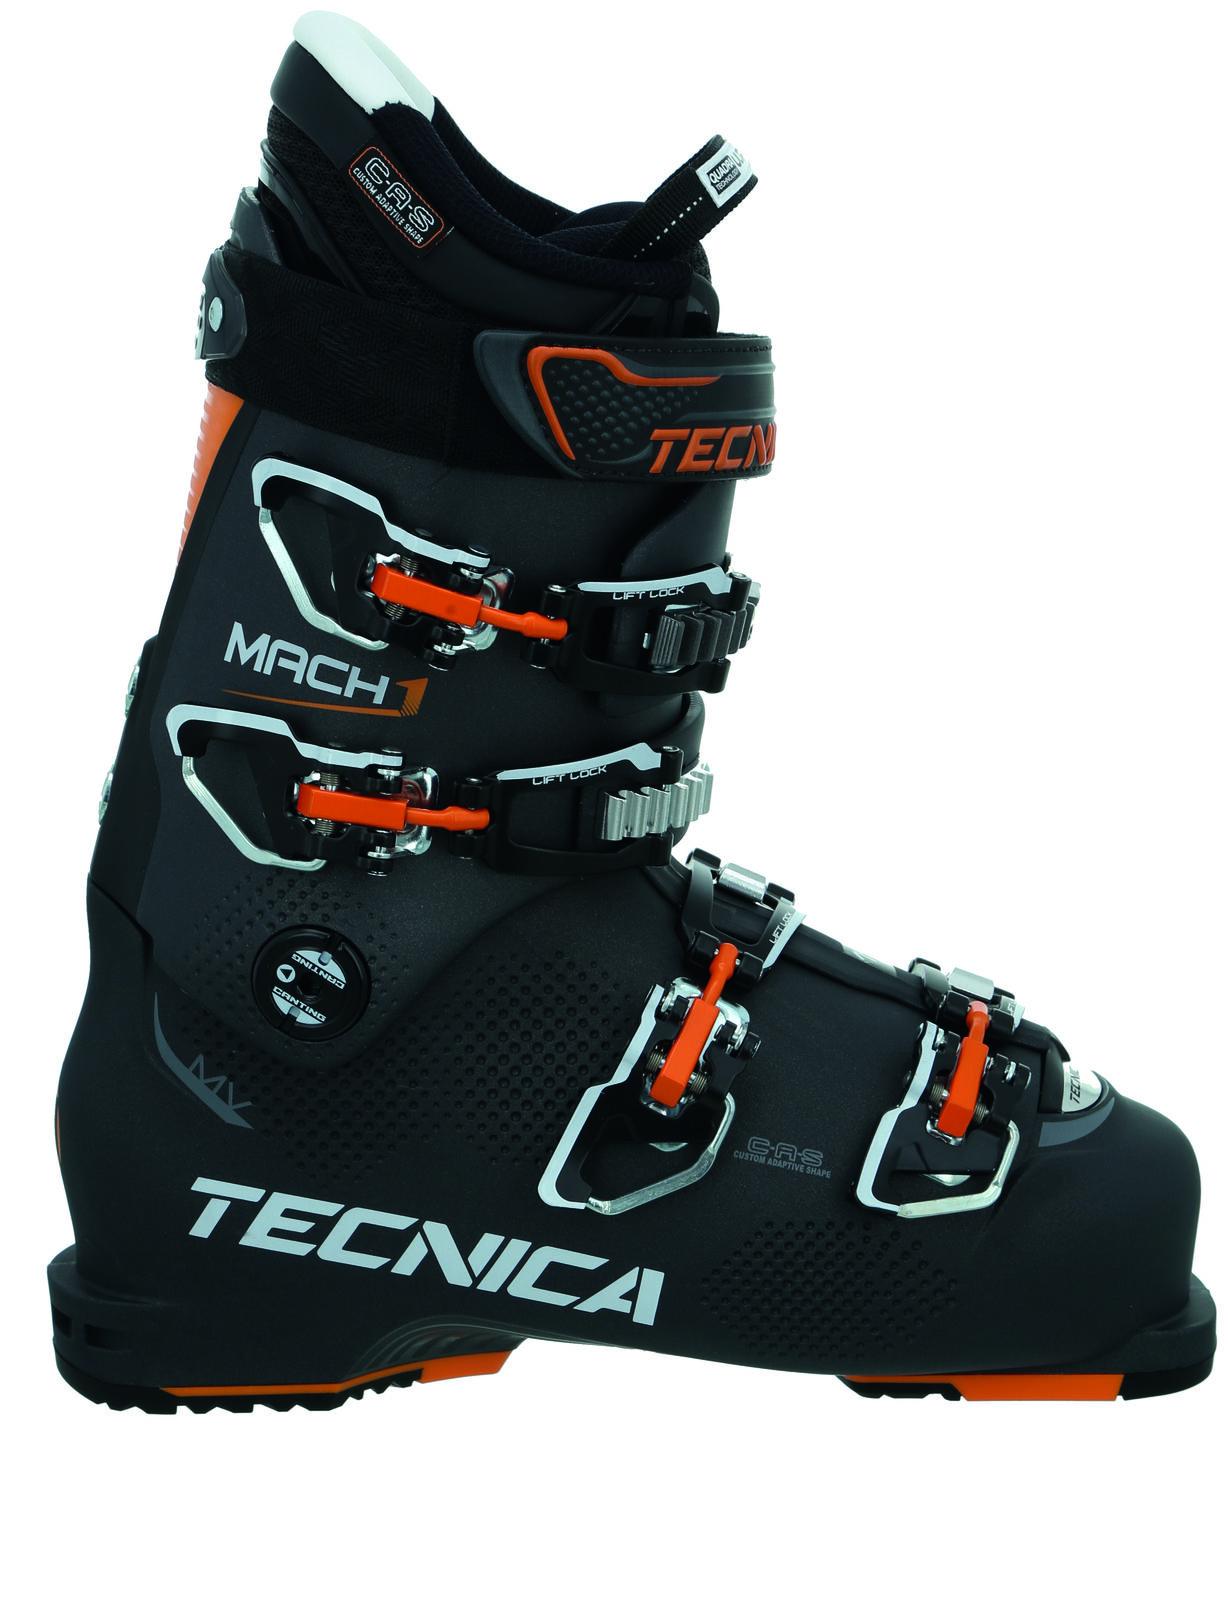 Tecnica MACH1 110 S MV 18 19 (101837) - Skischuhe High Performance